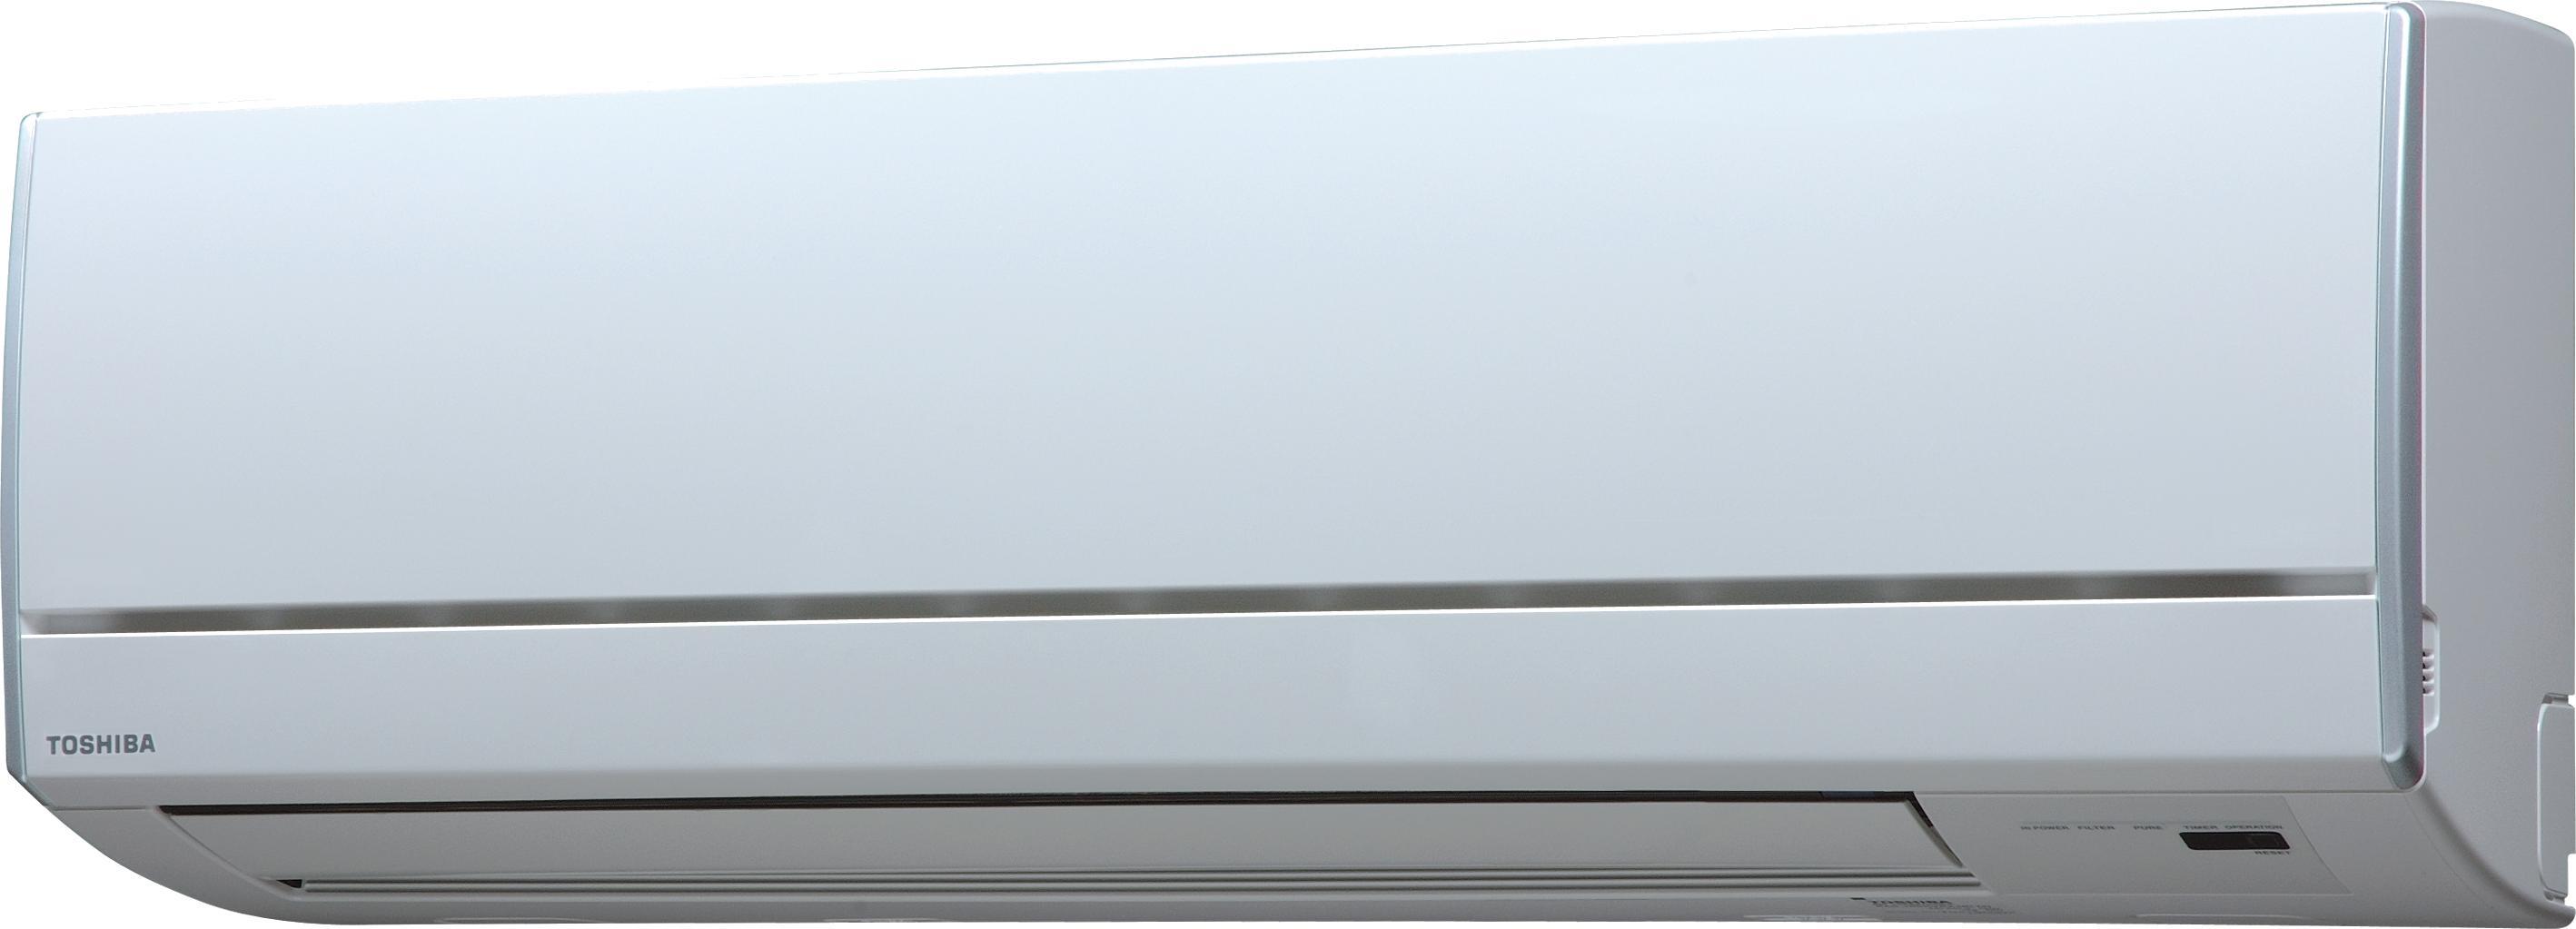 Toshiba RAS-13SKP-ES